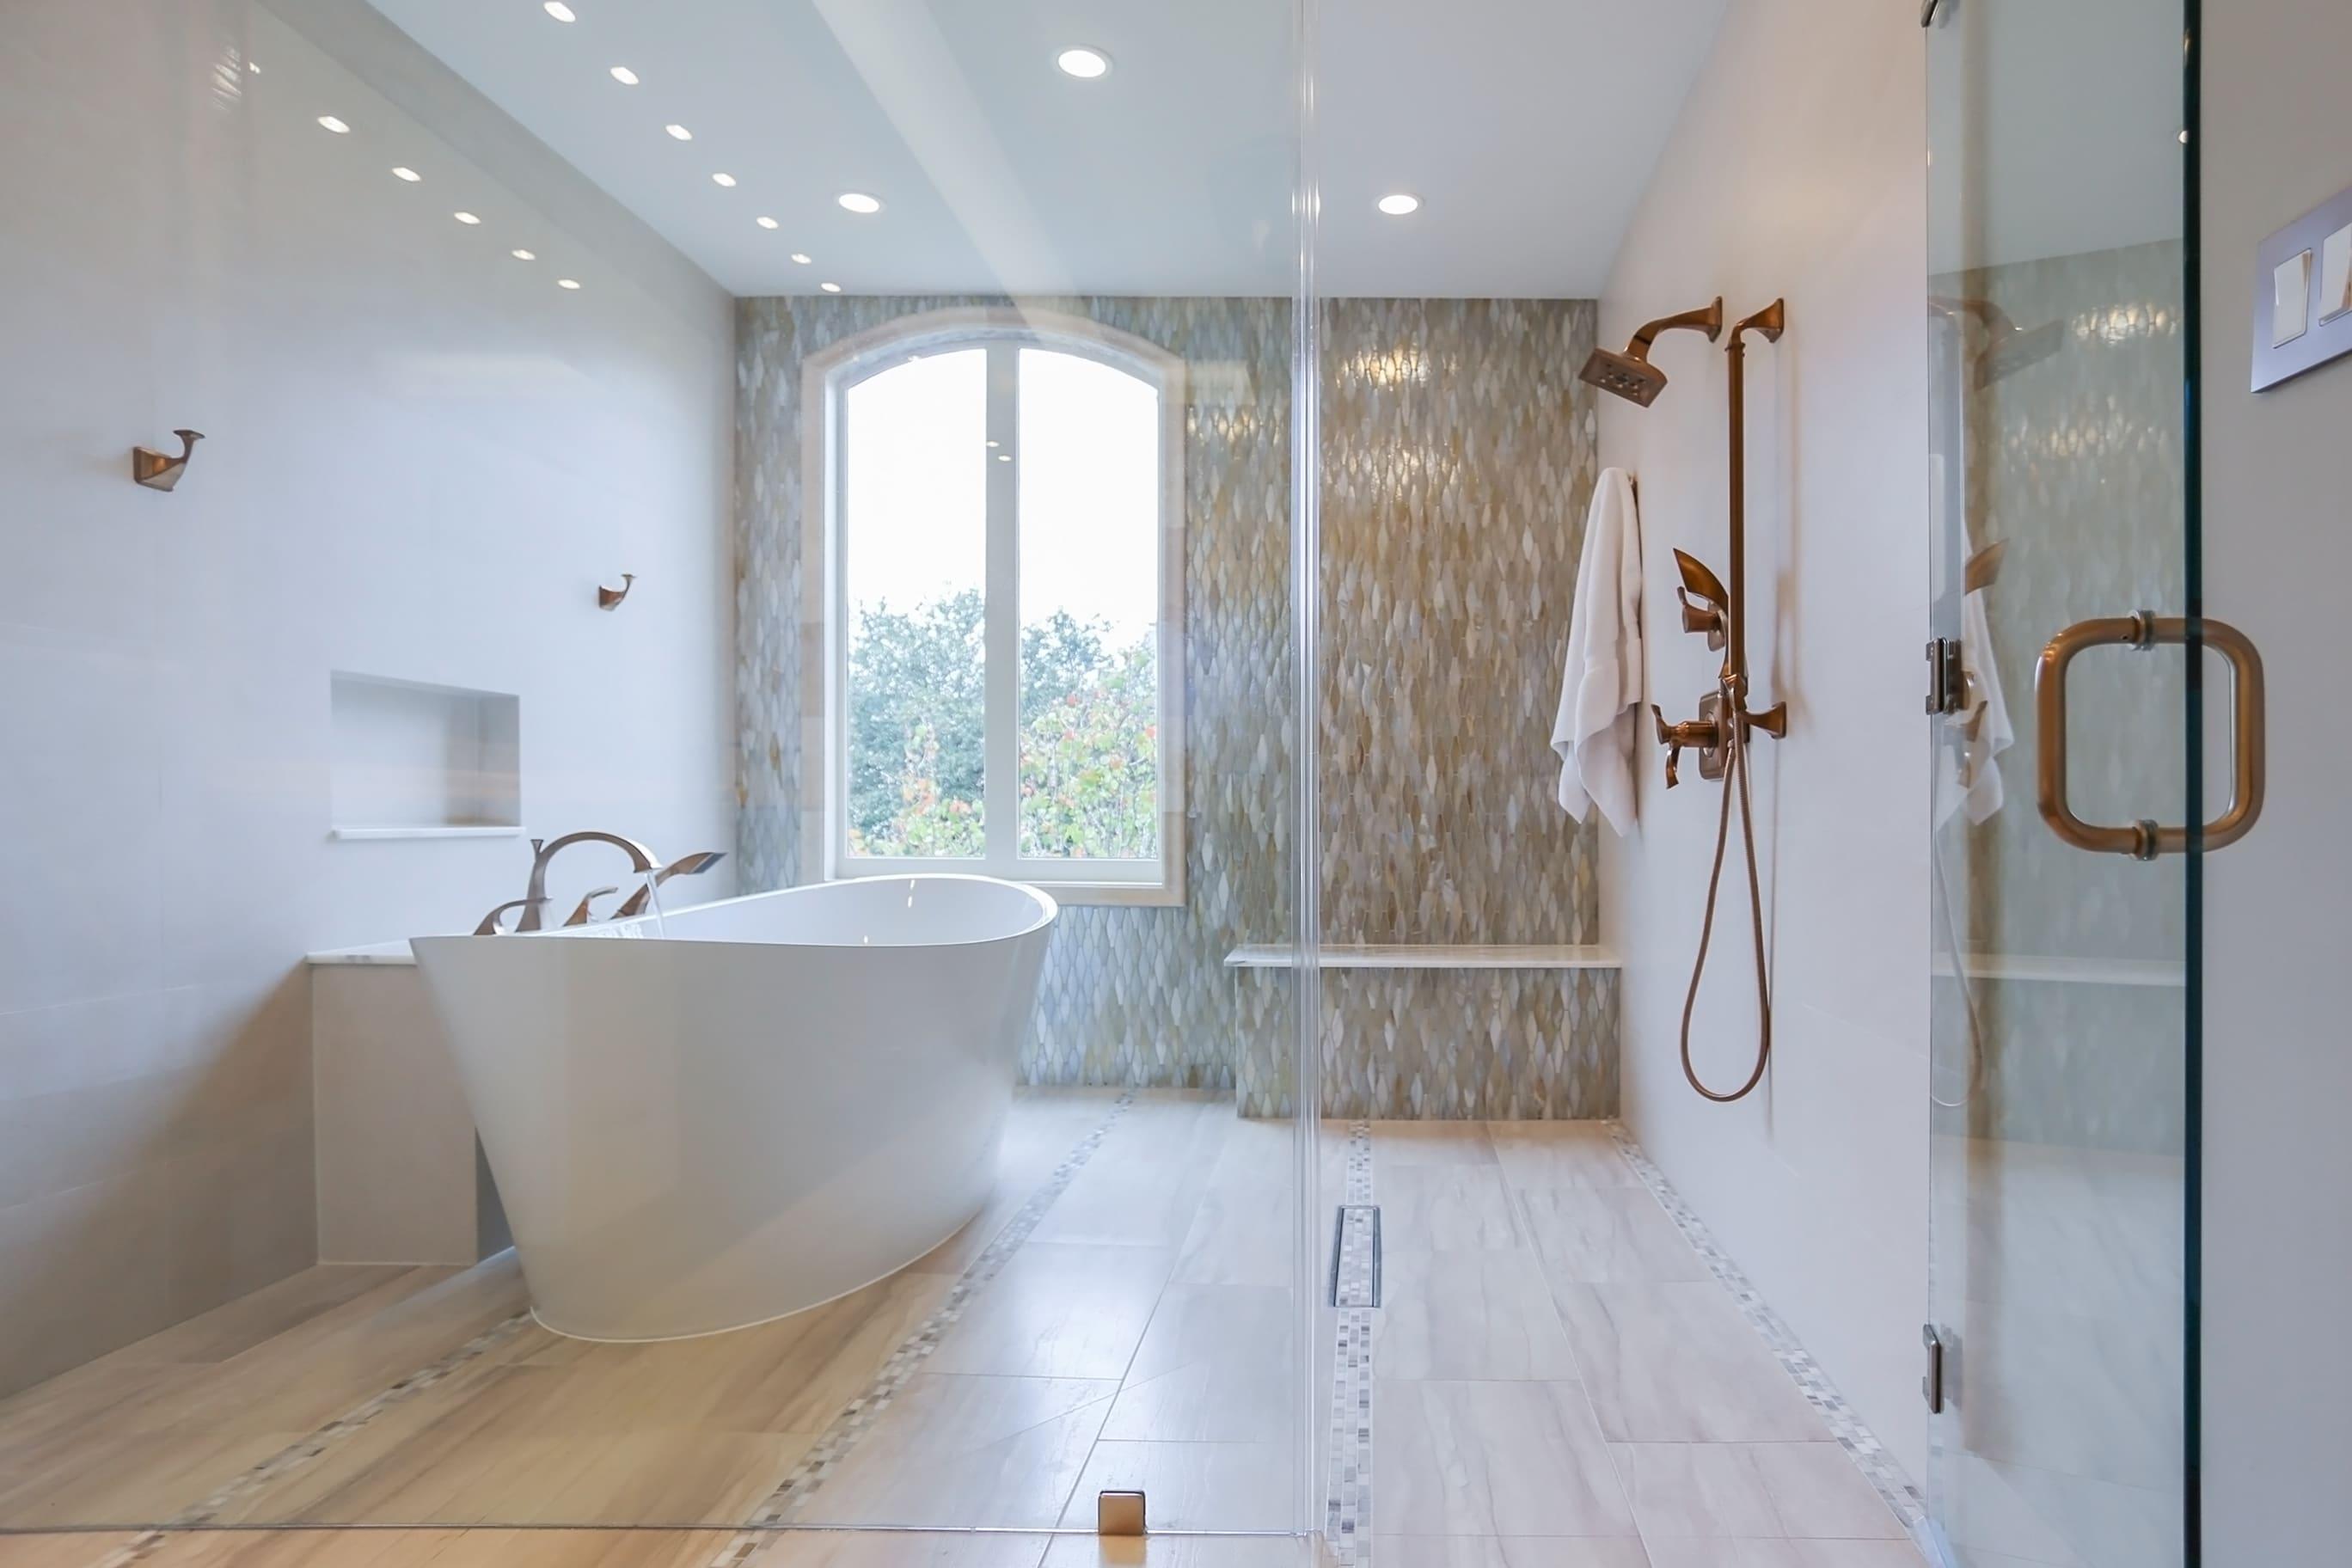 River Oaks   Houston, Texas   Tranquil Spa Master Bathroom Remodel (3 of 10)